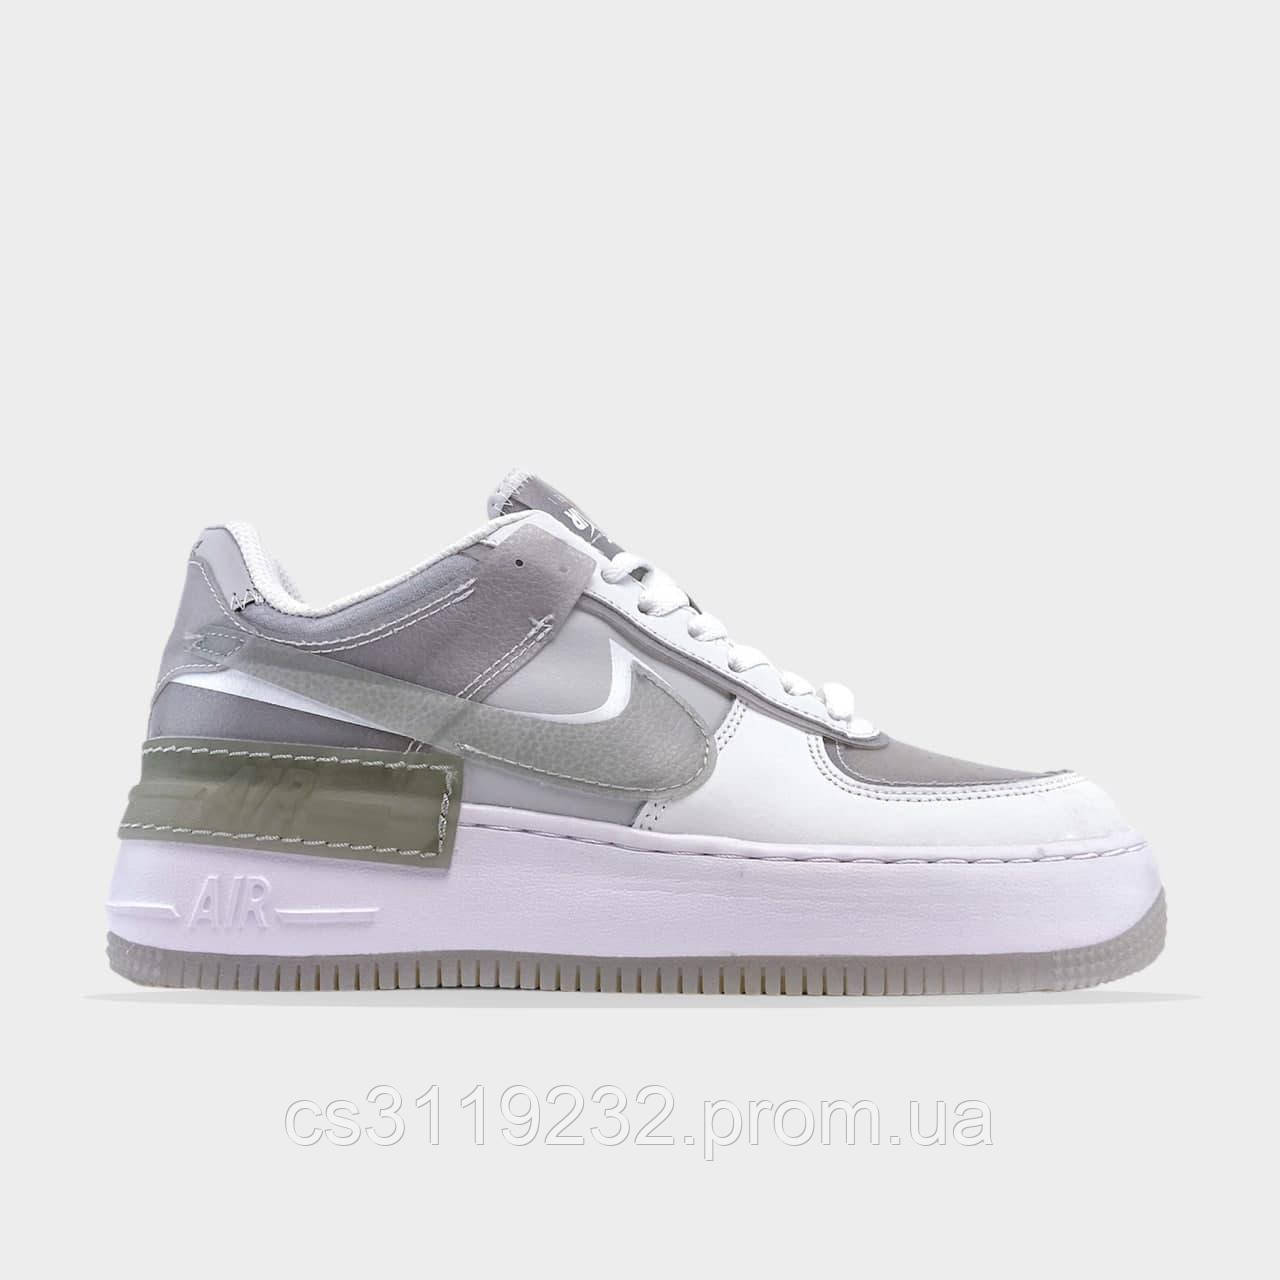 Женские кроссовки Nike Air Force Shadow Grey White (белый)